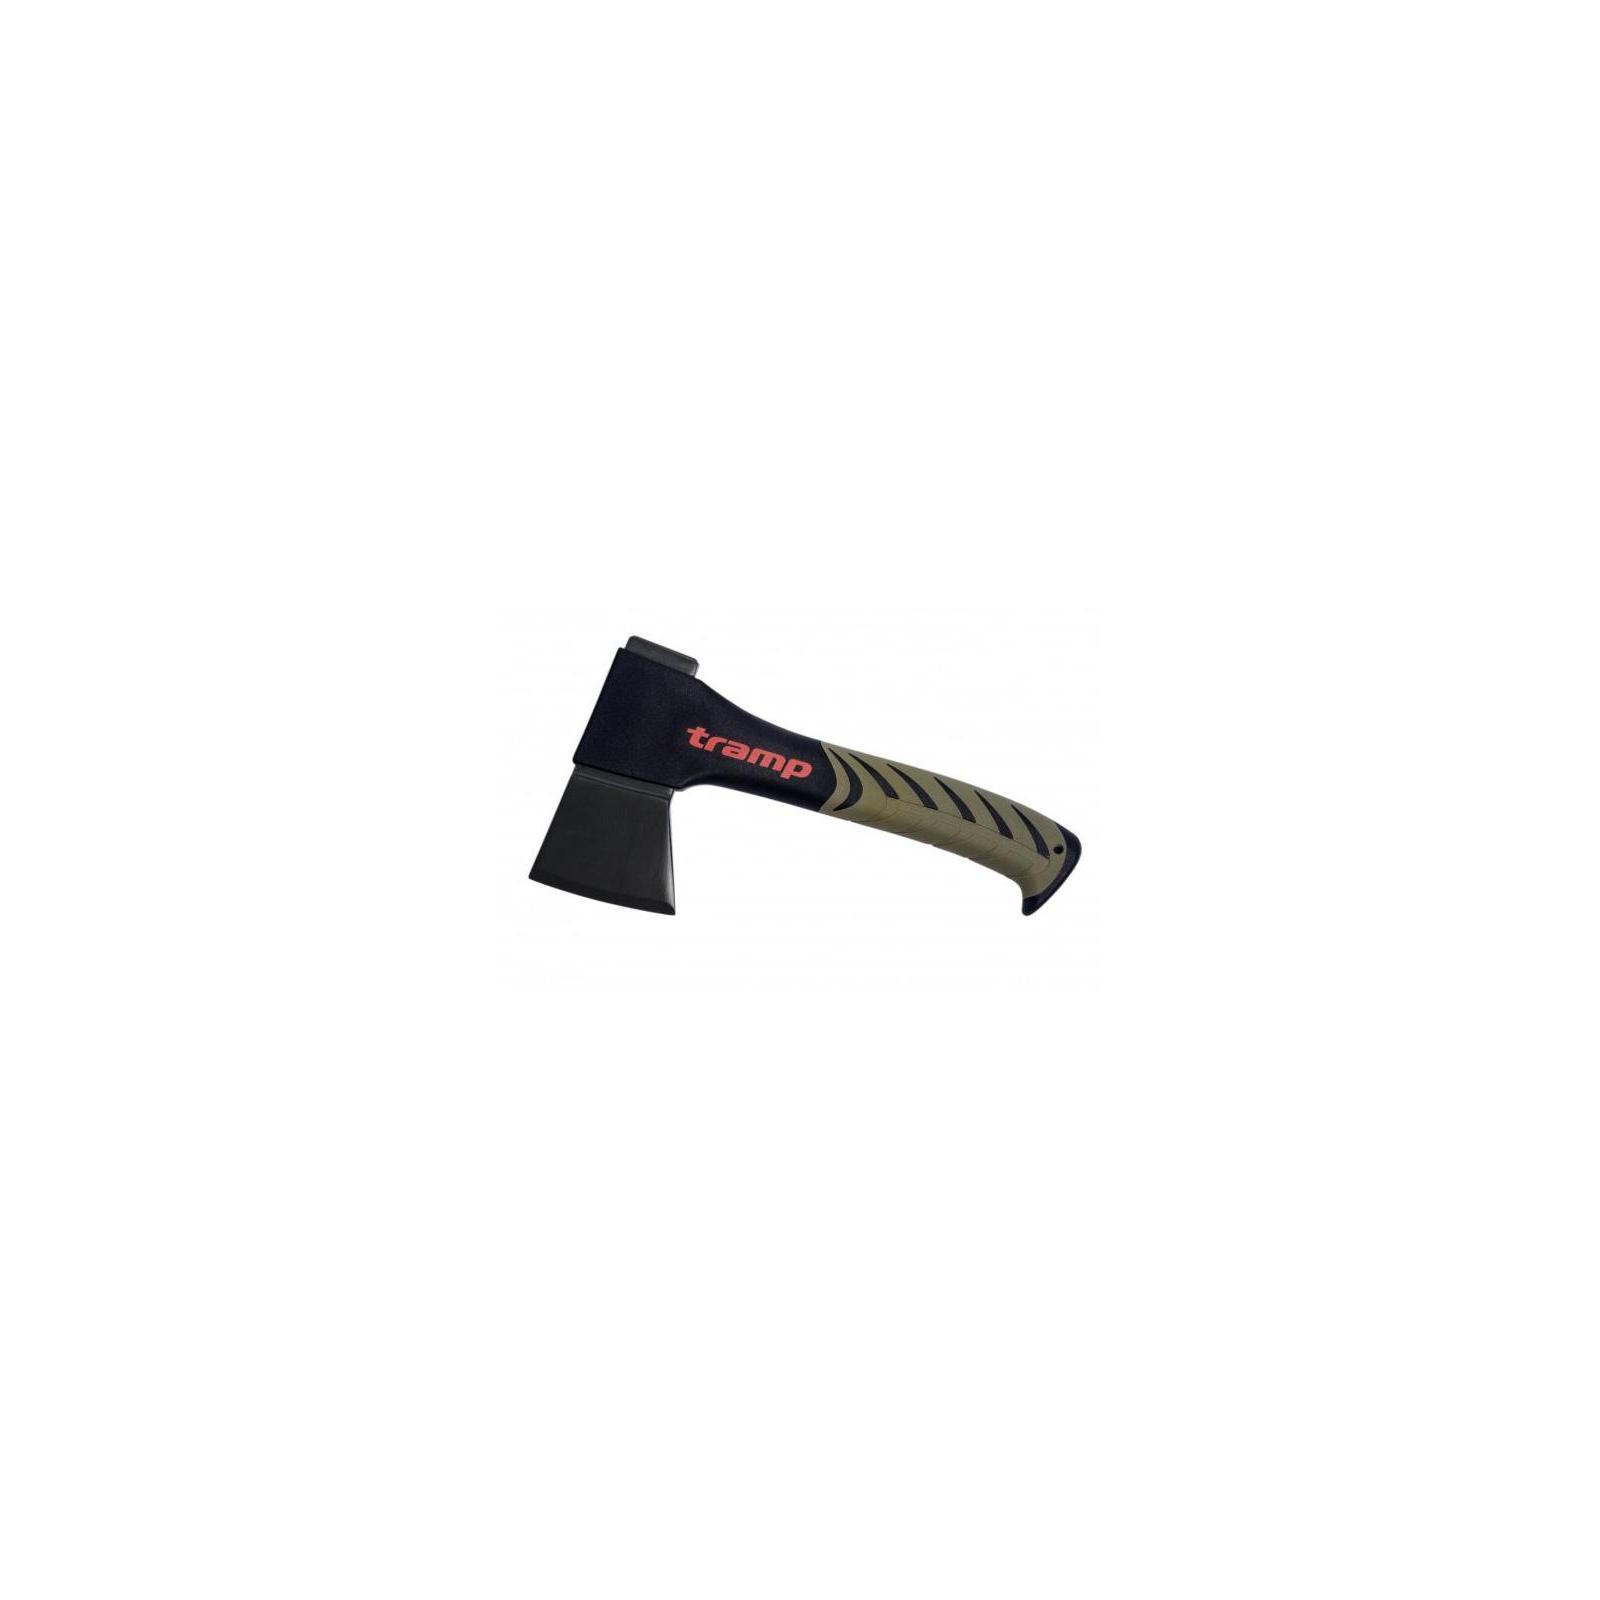 Топор Tramp 45 см (TRA-180)